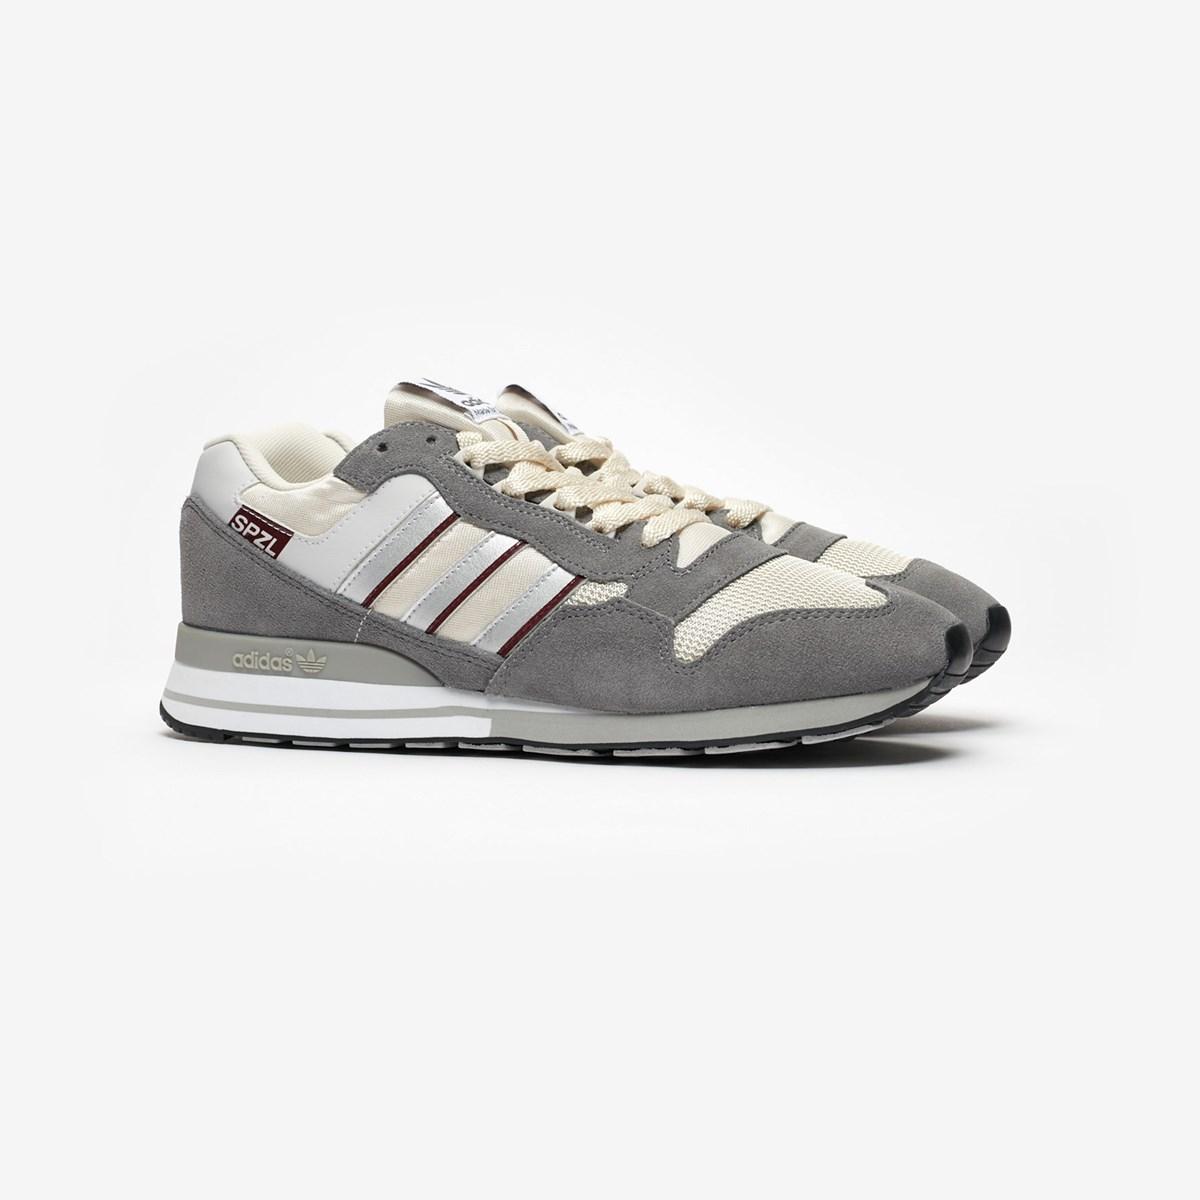 adidas ZX530 - F35718 - Sneakersnstuff